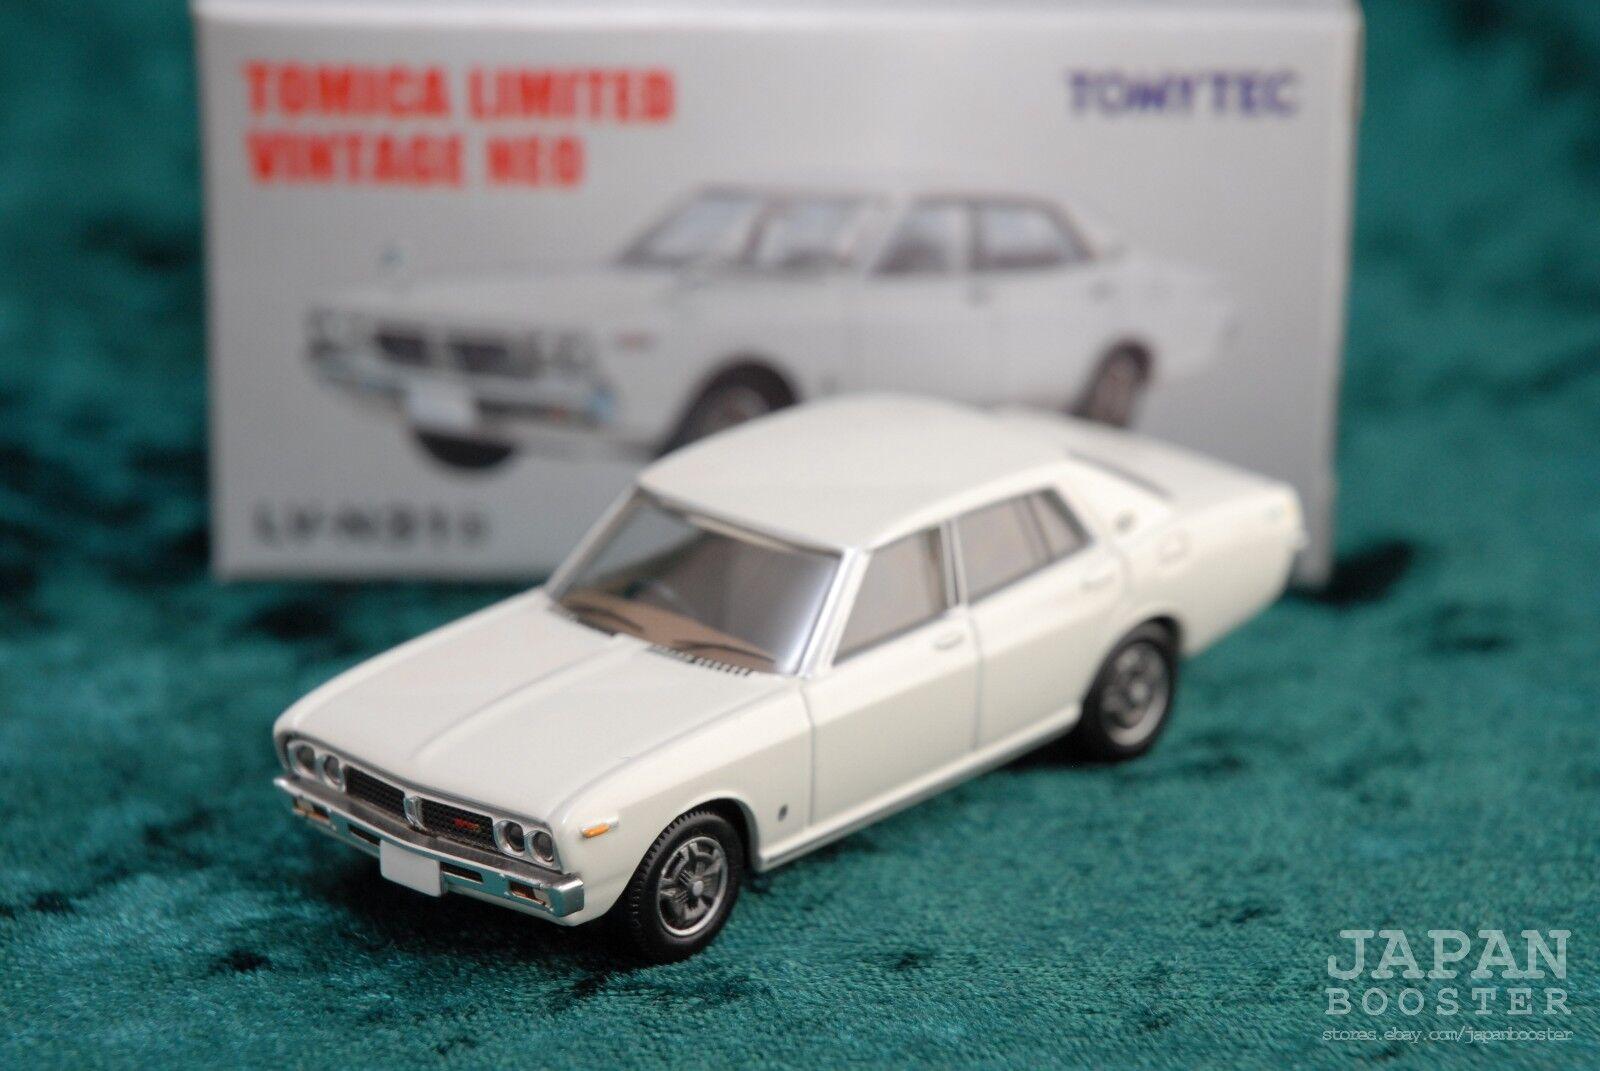 Tomica Limited Vintage Neo Lv N31b 1 64 Nissan Laurel 2000 Gx 6 White